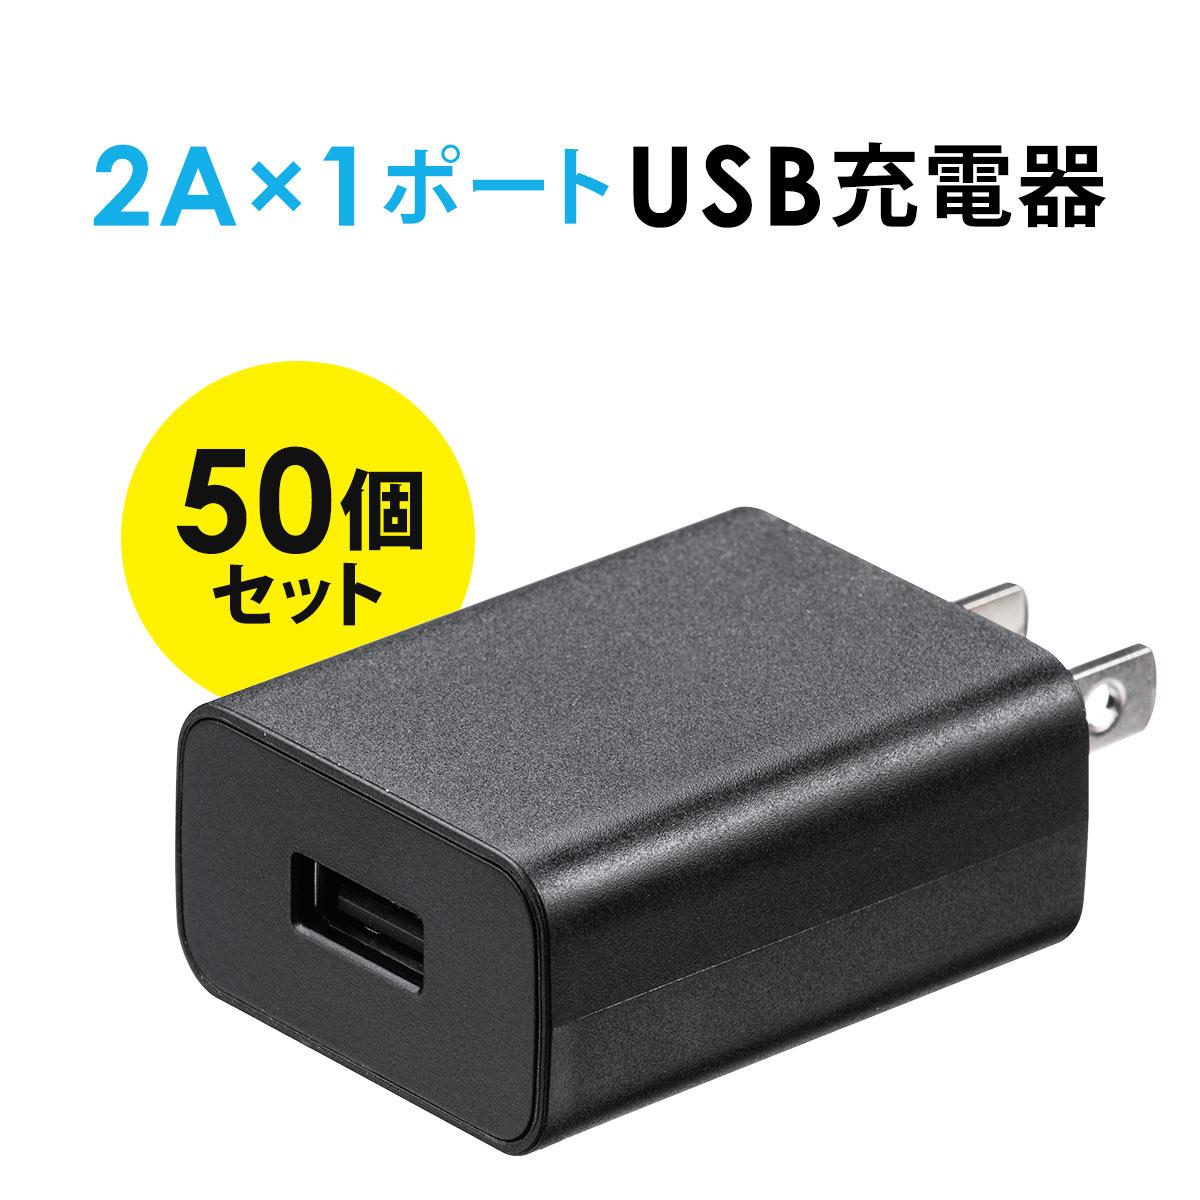 702-AC021-50 サンワダイレクト限定品 送料無料 50個セット USB充電器 今季も再入荷 1ポート ブラック 奉呈 PSE取得 コンパクト iPhone 2A Xperia充電対応